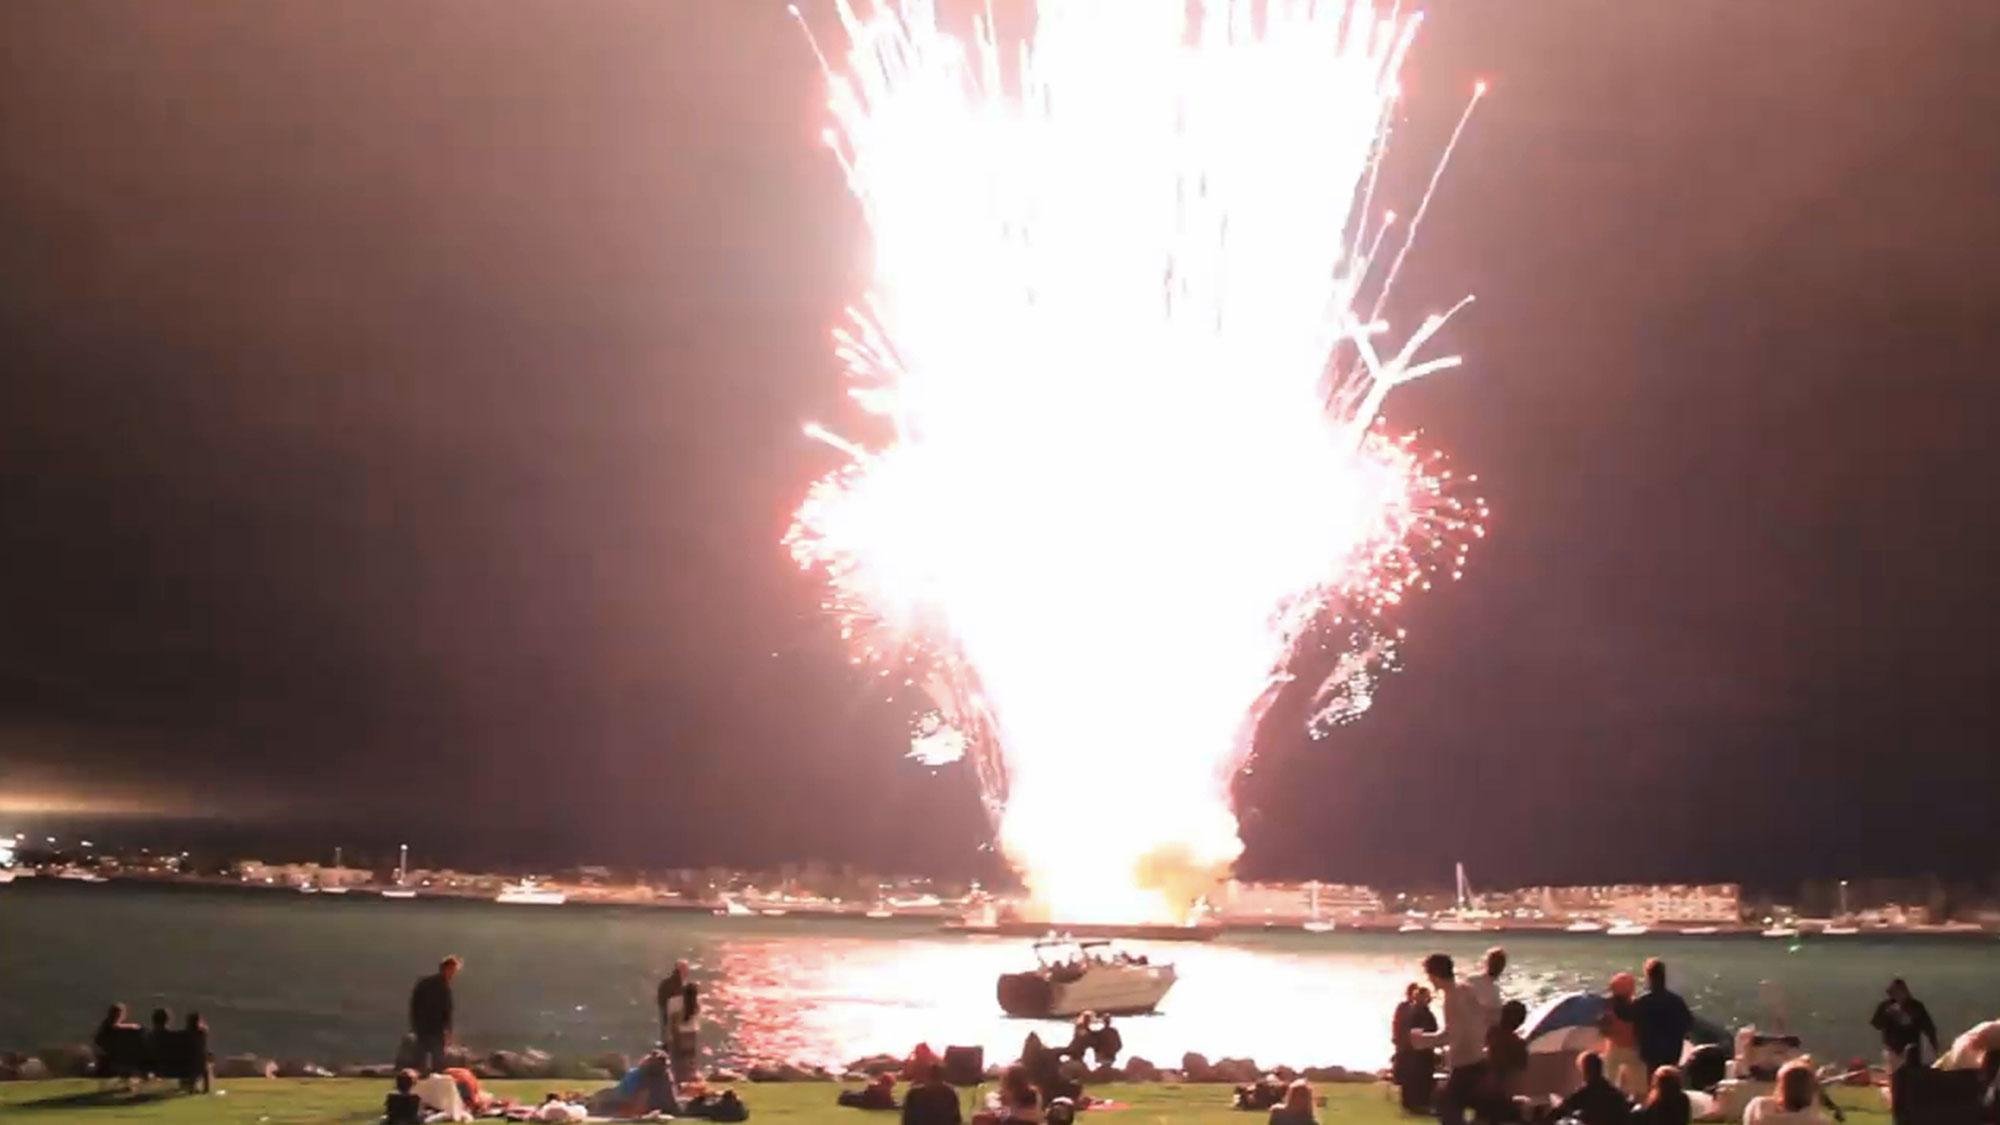 Le feu d'artifice de San Diego en 2012.